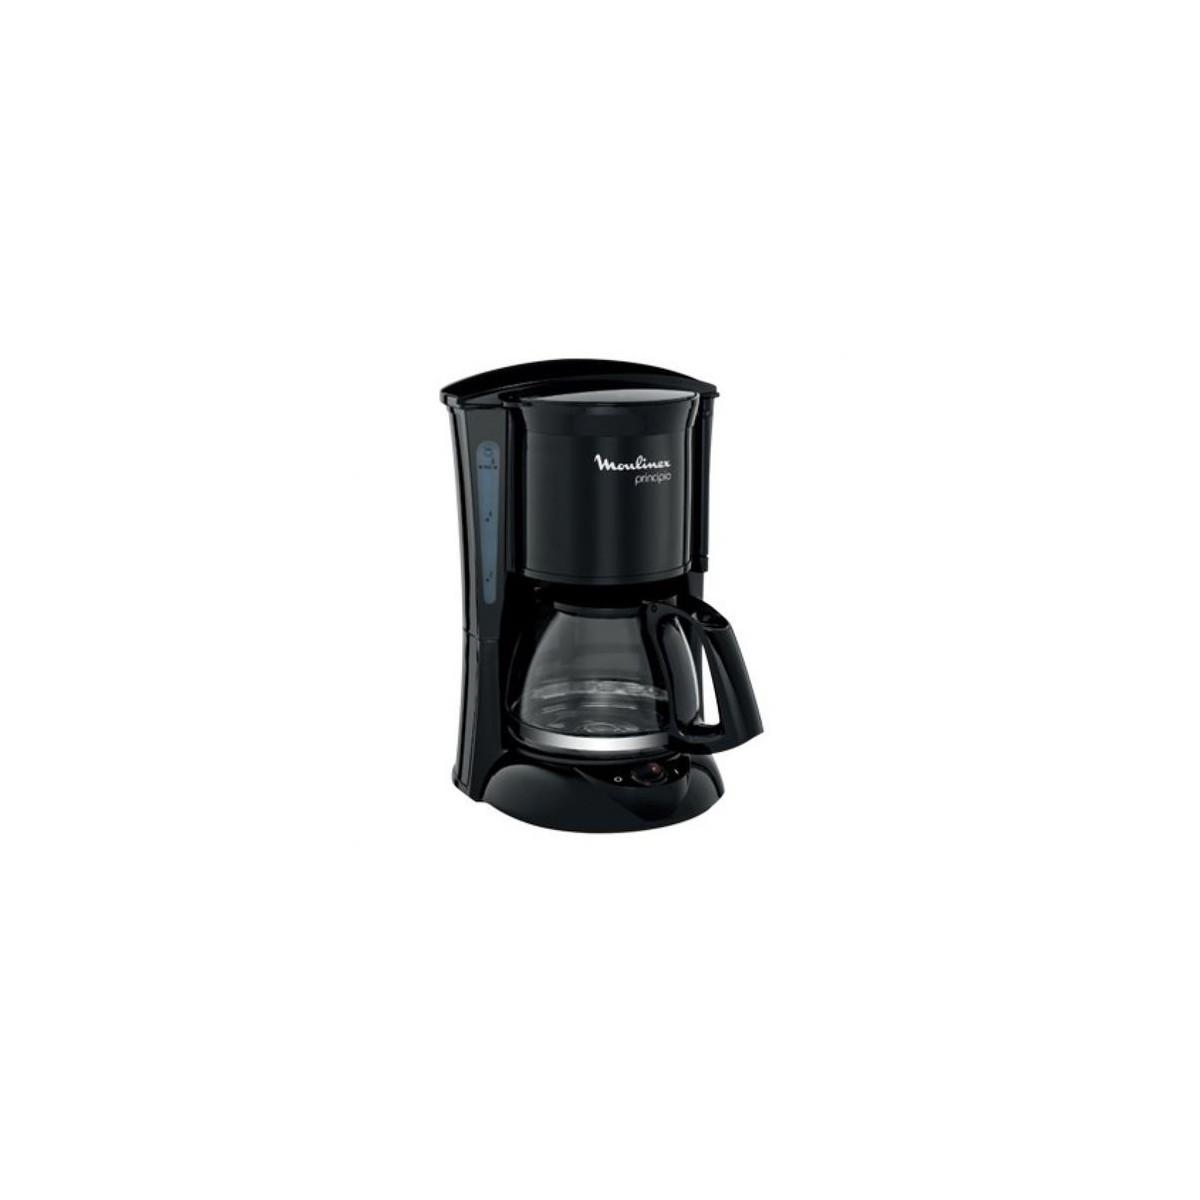 Cafetera Filtro Moulinex Fg152832 goteo 6tz